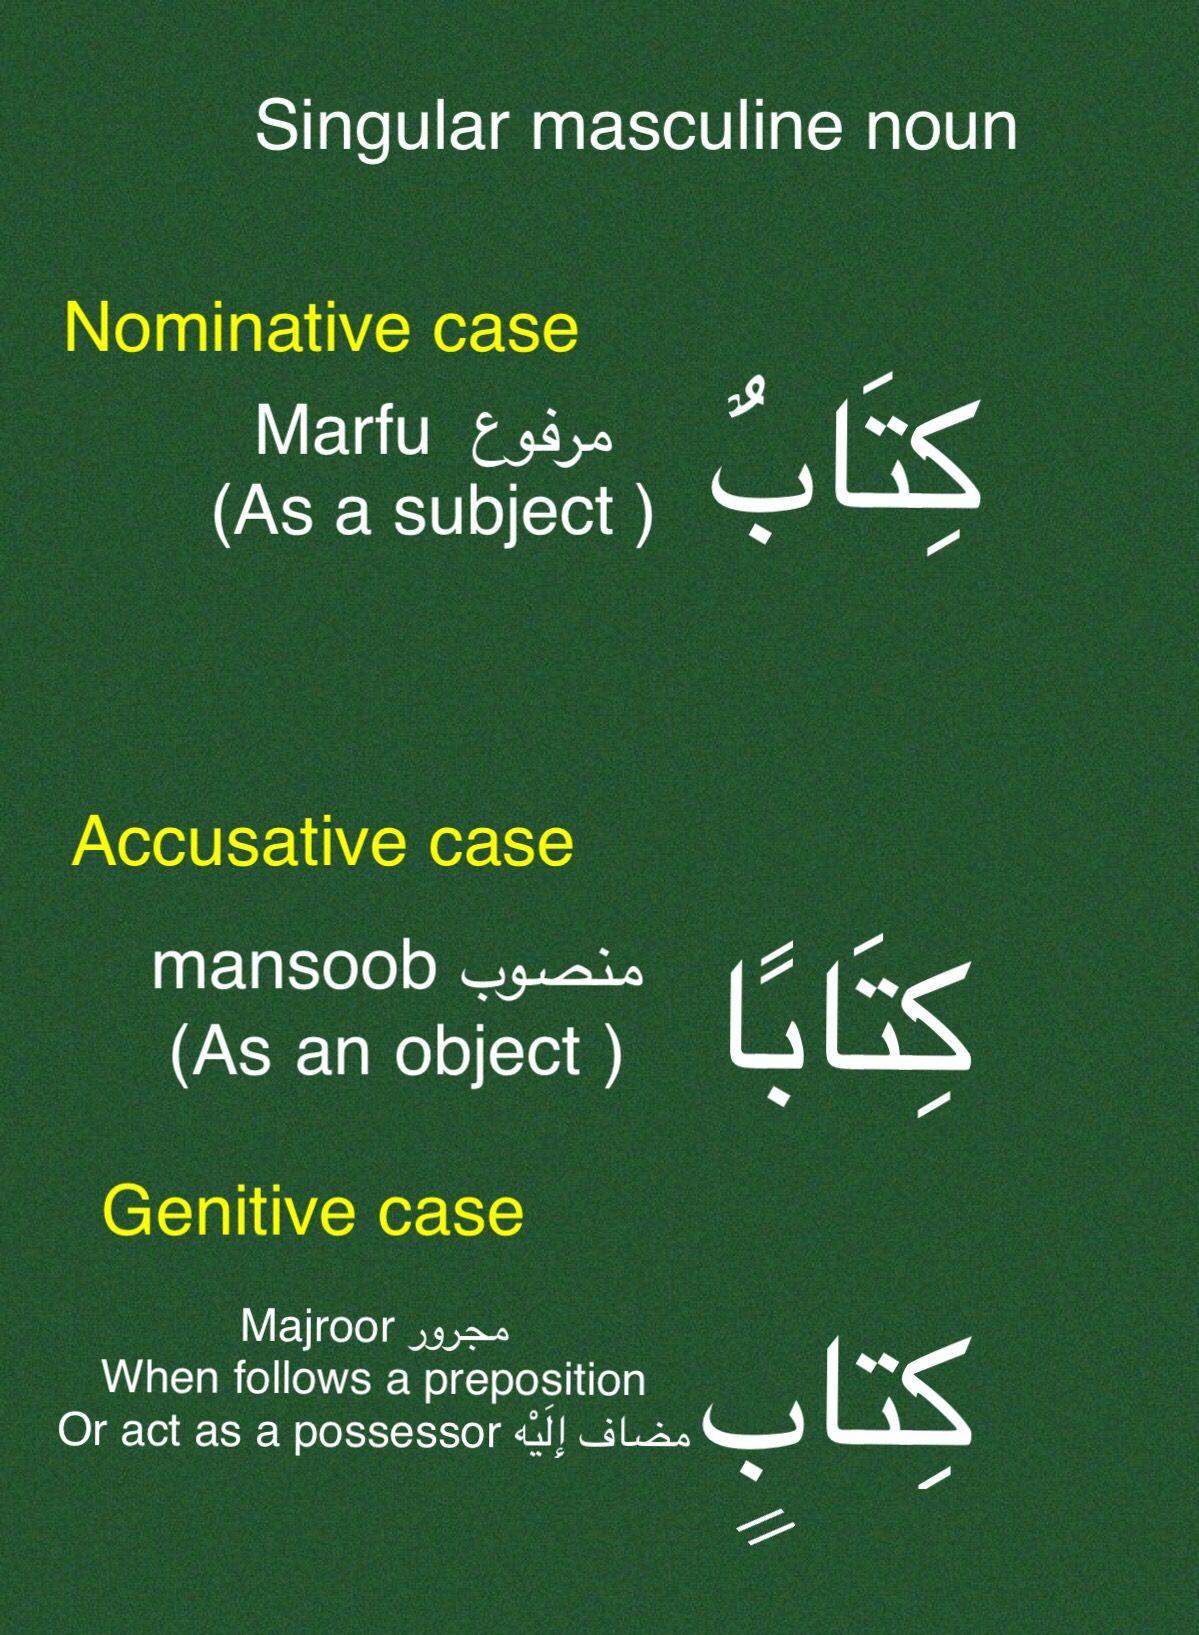 Pin by Nadia on Arabo | Arabic language, Spoken arabic ...